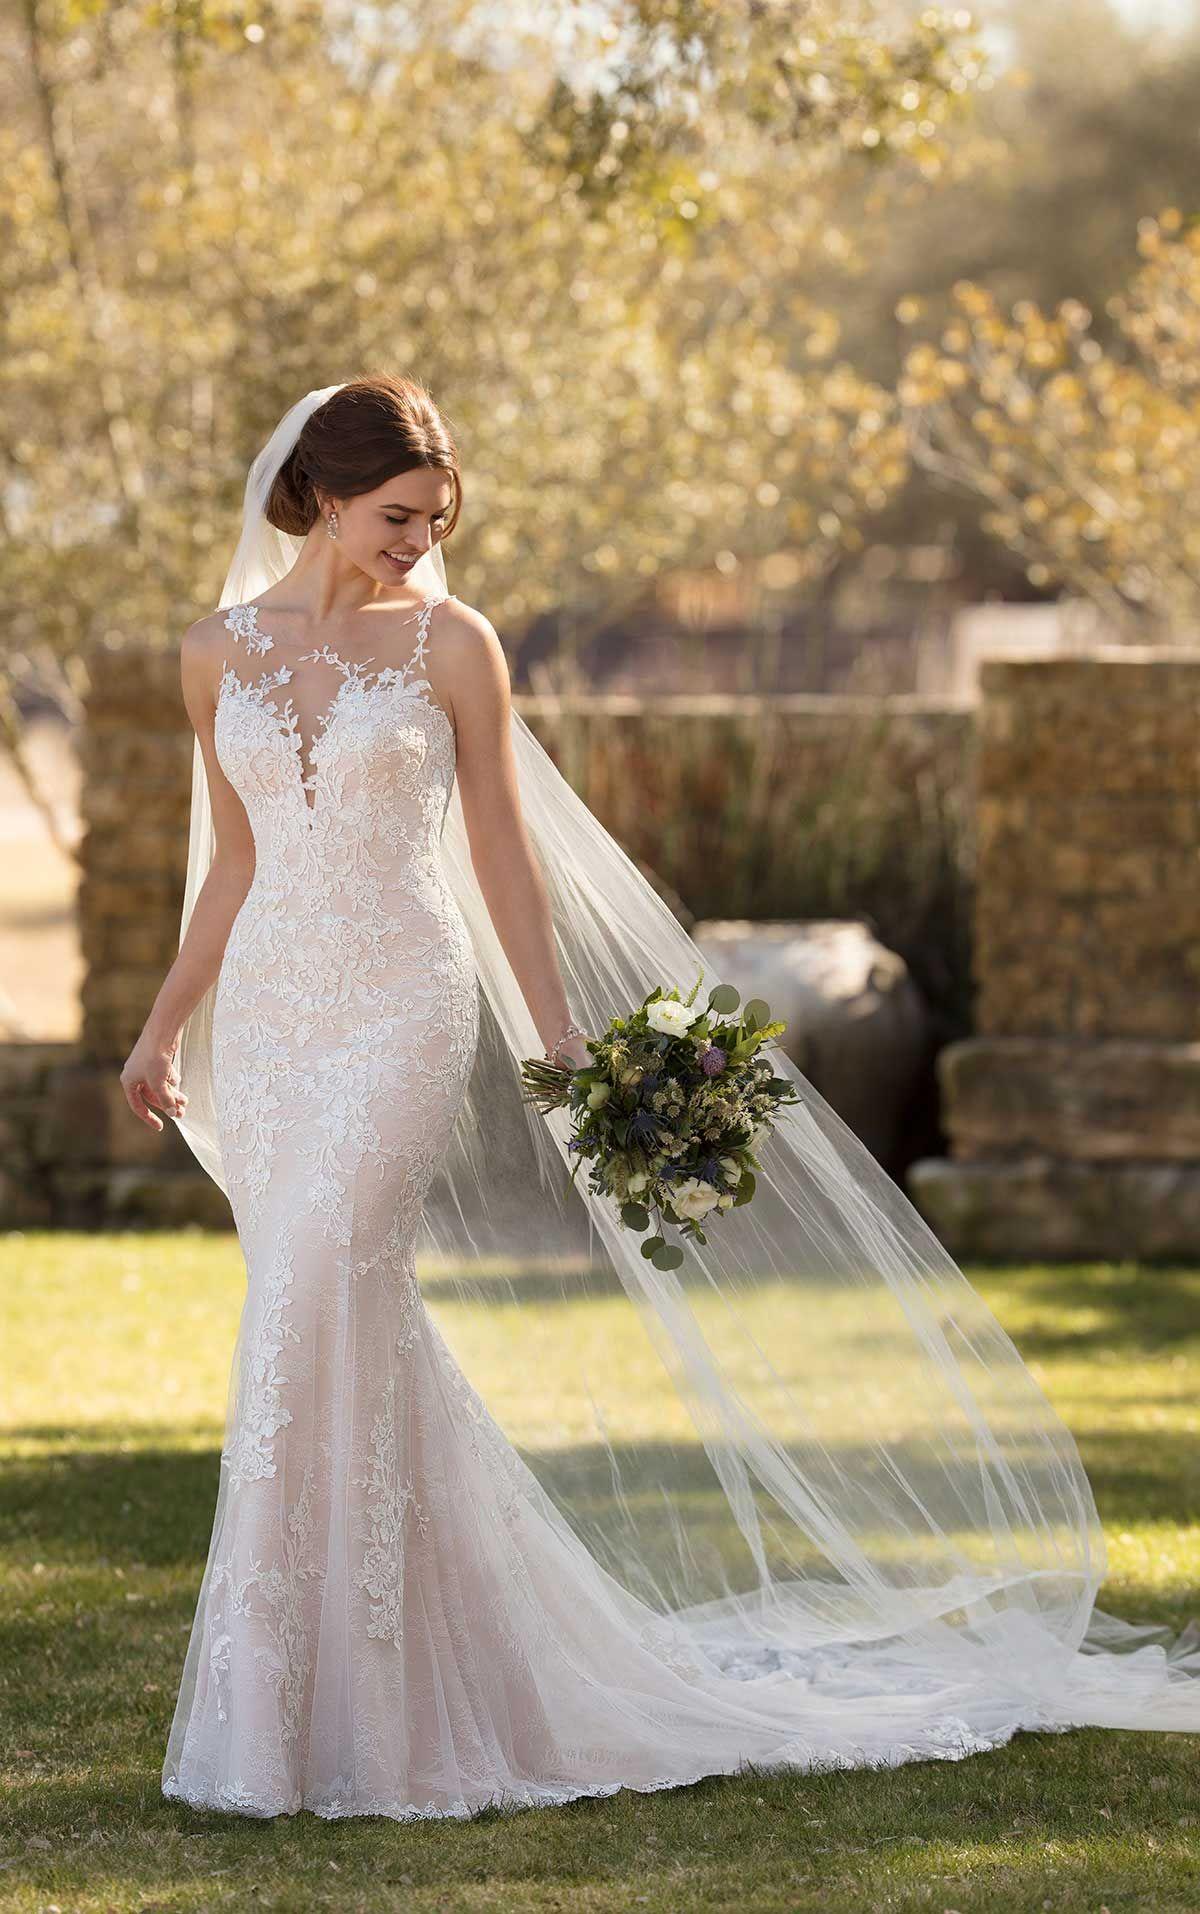 Layered Lace Wedding Dress With Asymmetrical Neckline Essense Of Australia Essense Of Australia Wedding Dresses Fitted Wedding Dress Wedding Dress Guide [ 1914 x 1200 Pixel ]